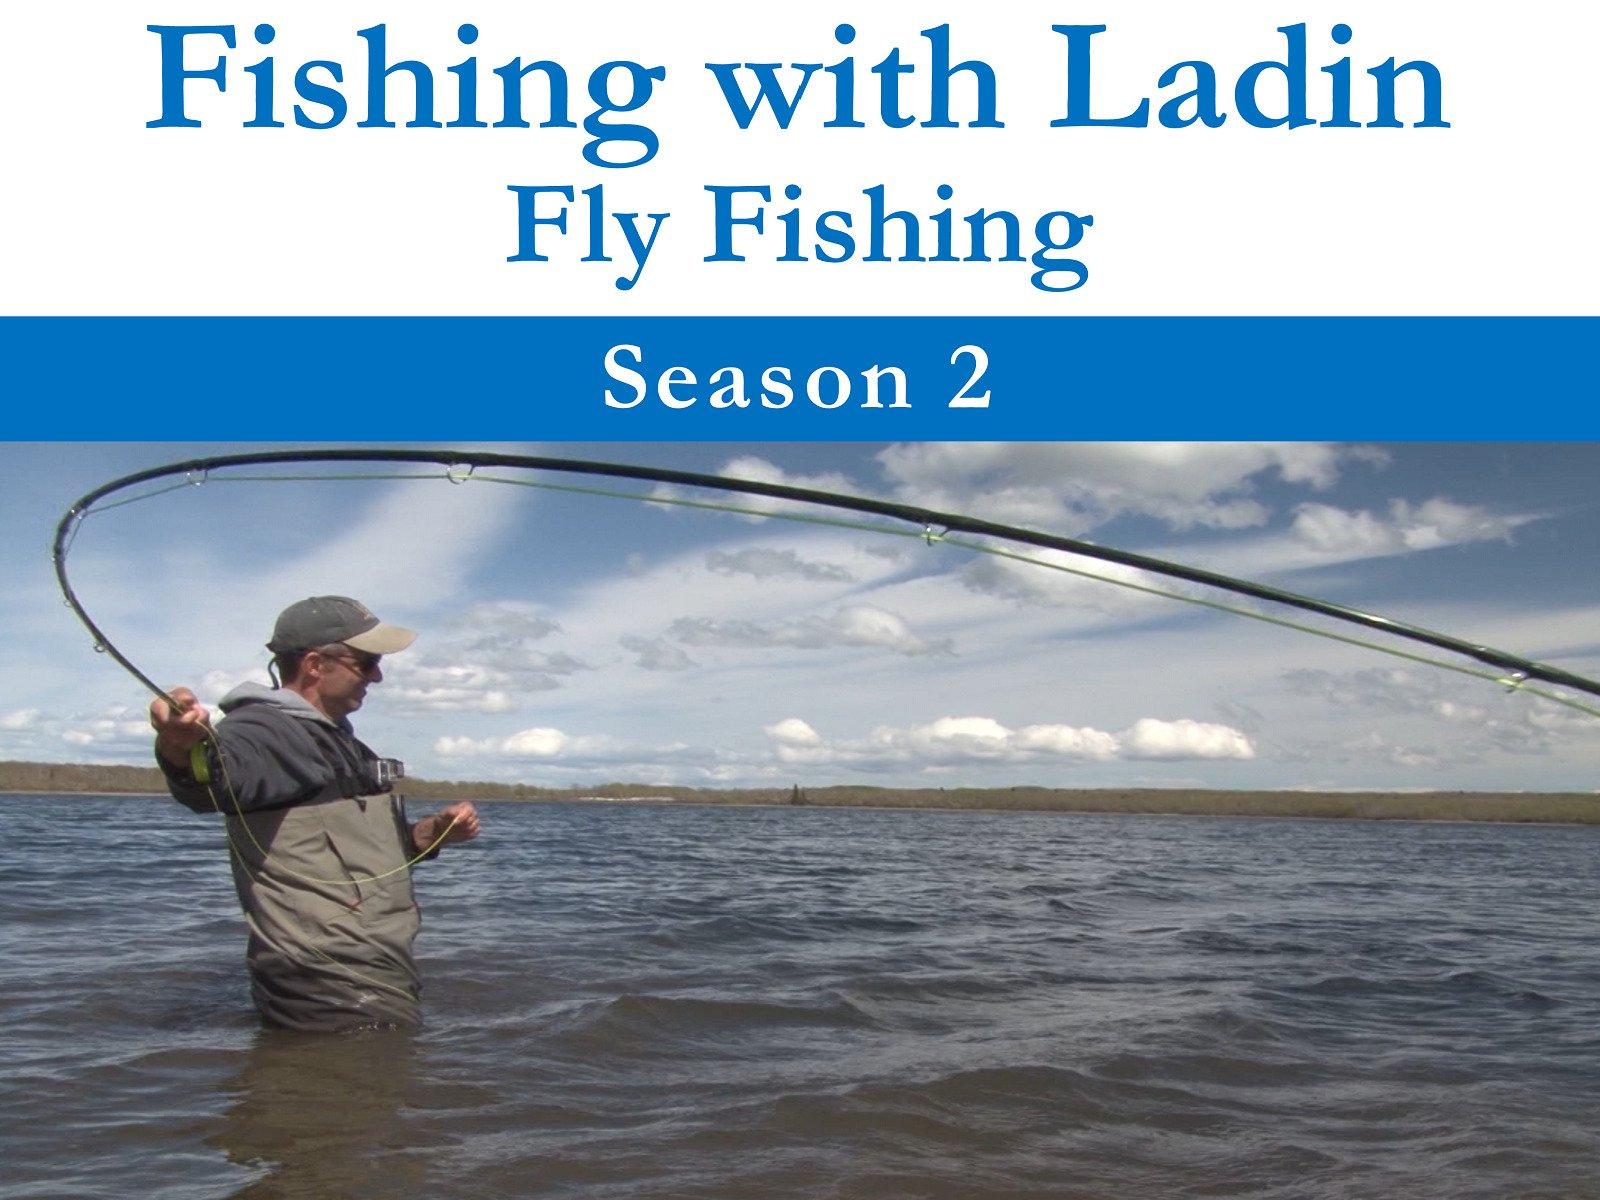 Fishing with Ladin: Fly Fishing on Amazon Prime Video UK